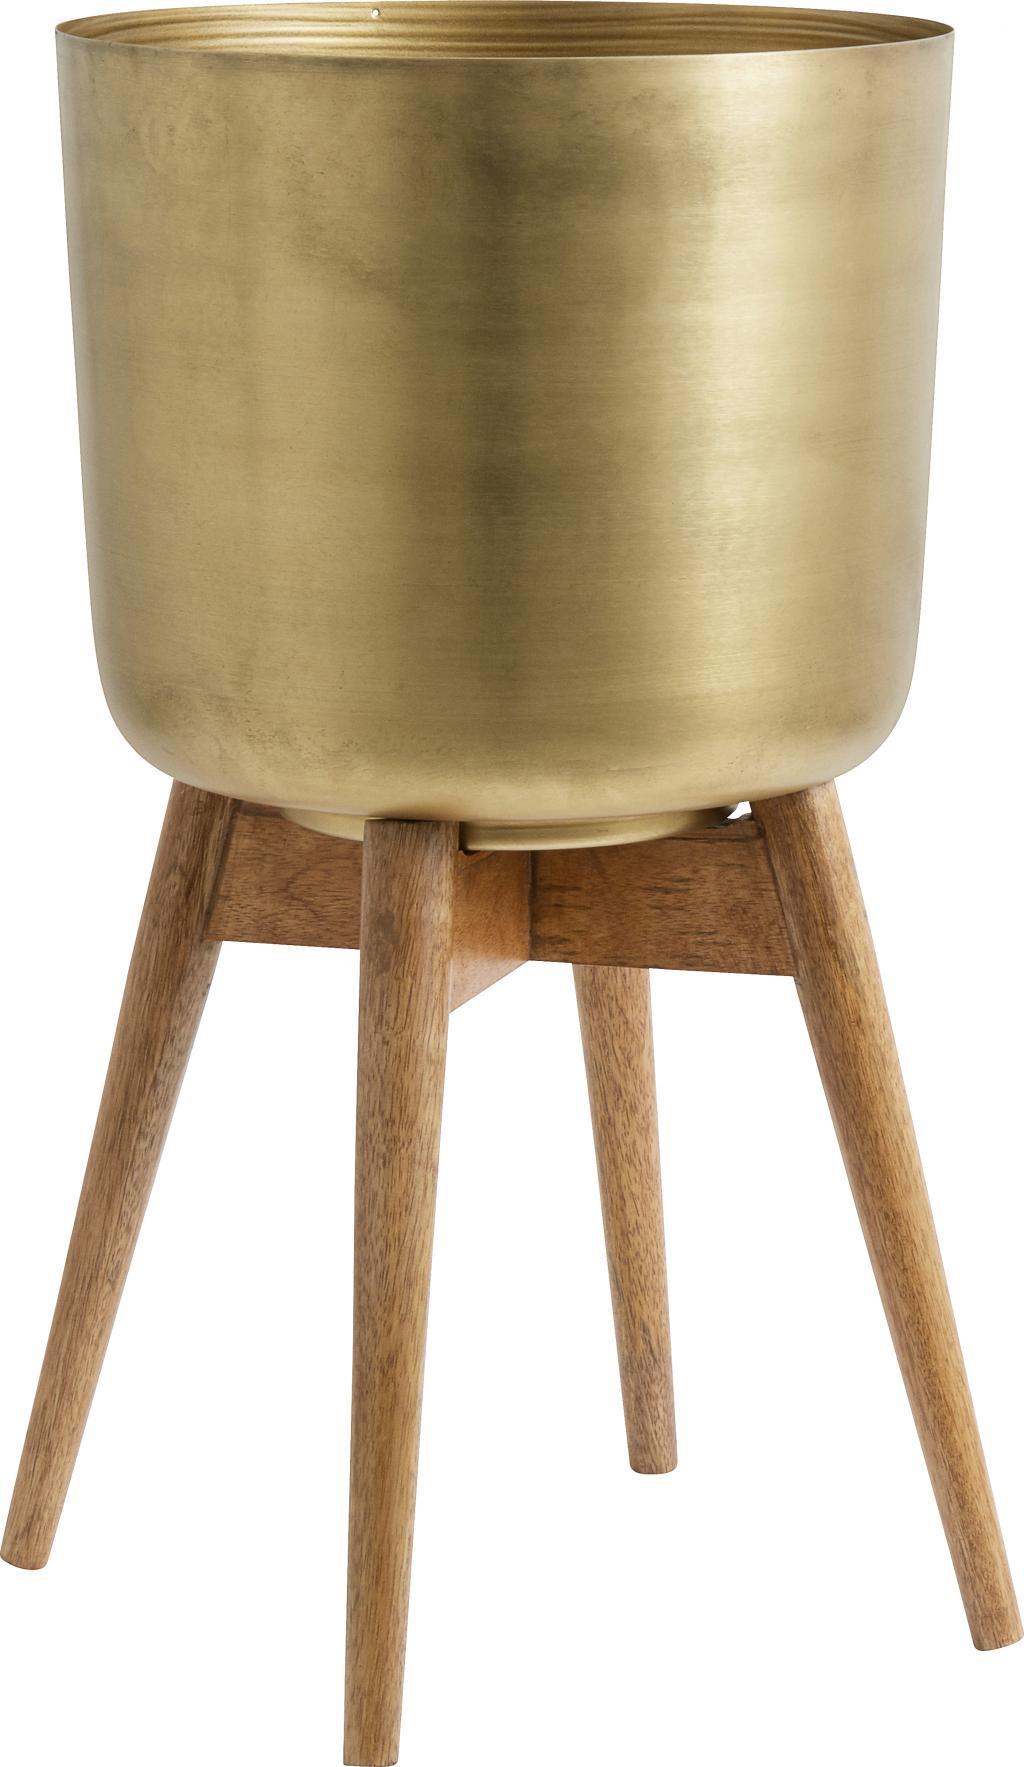 plantenbak---goud---staal-hout---52x35---nordal[0].jpg